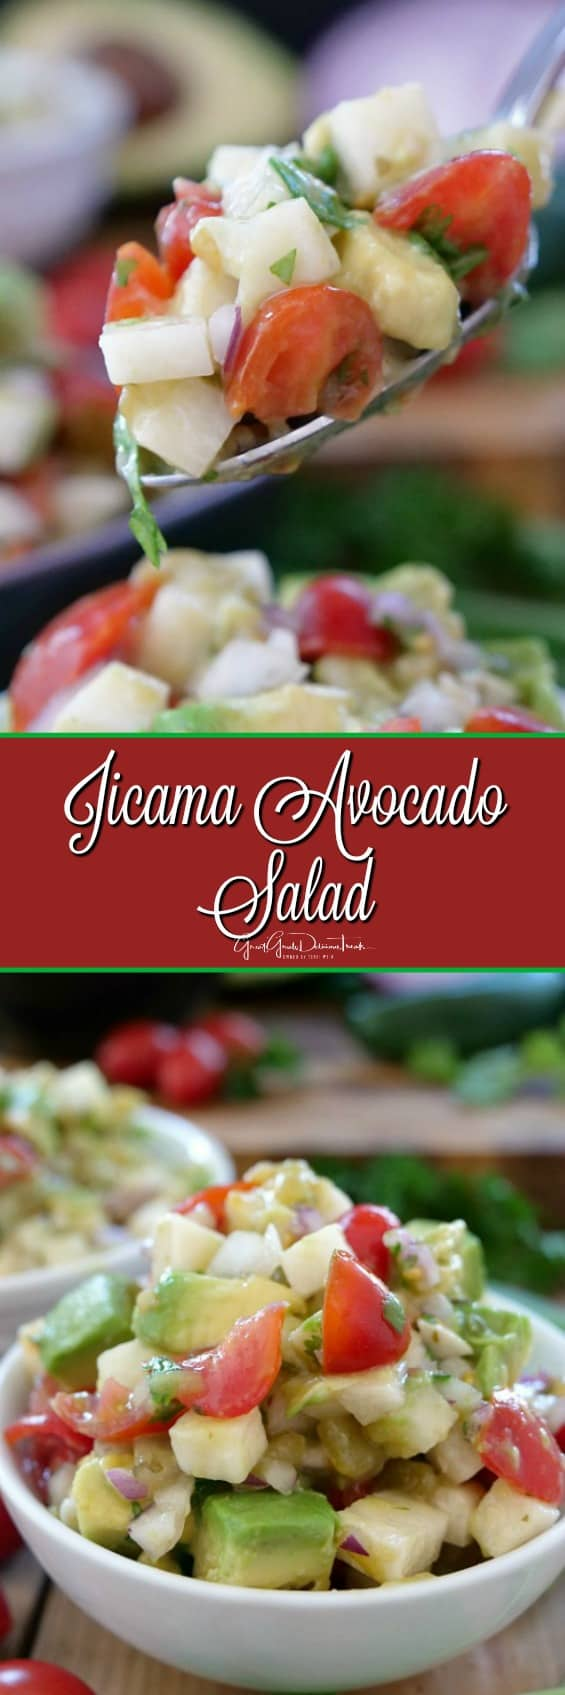 Jicama Avocado Salad